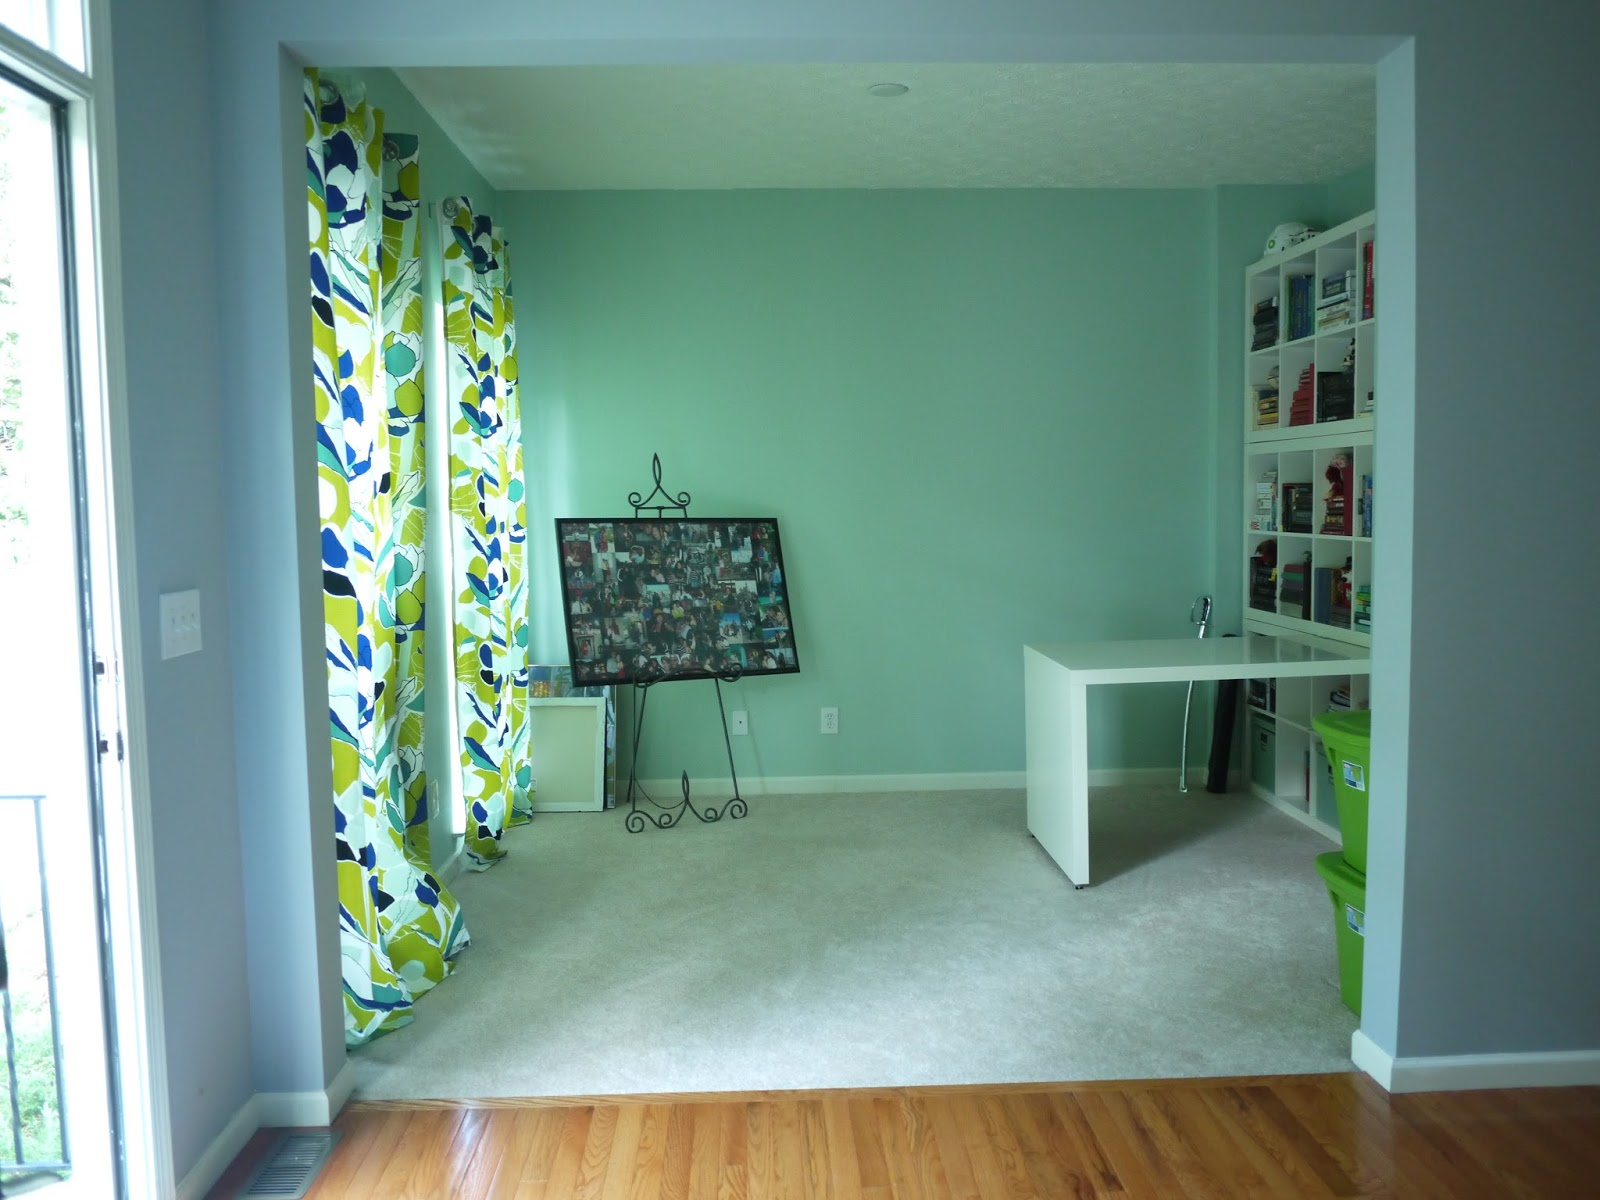 Light green room colors - Green Best Exterior House Paint Colors Choosing Best Exterior Modern Day Jibarita February 2014